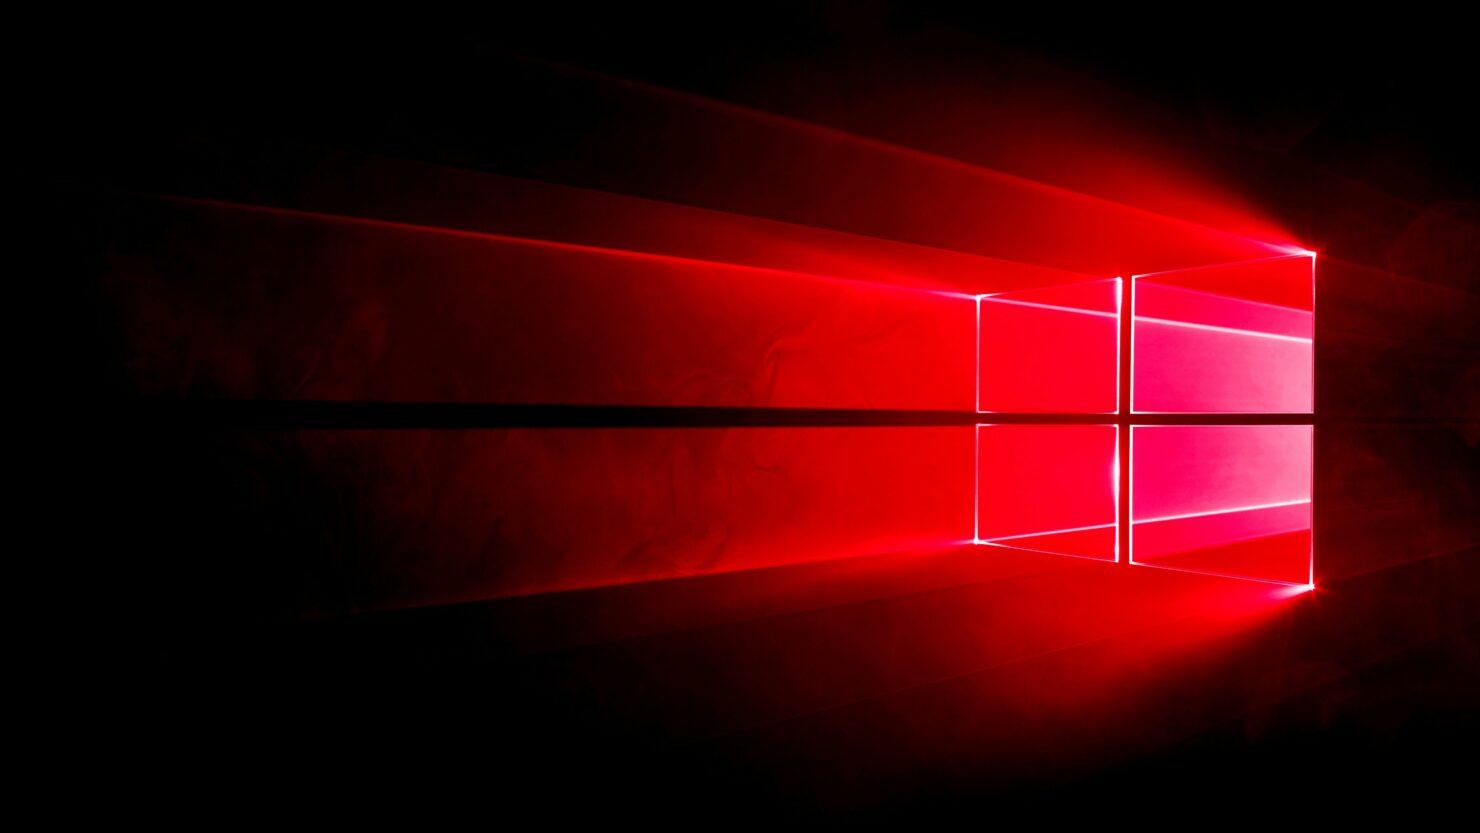 Windows 10 RS5 Redstone 5